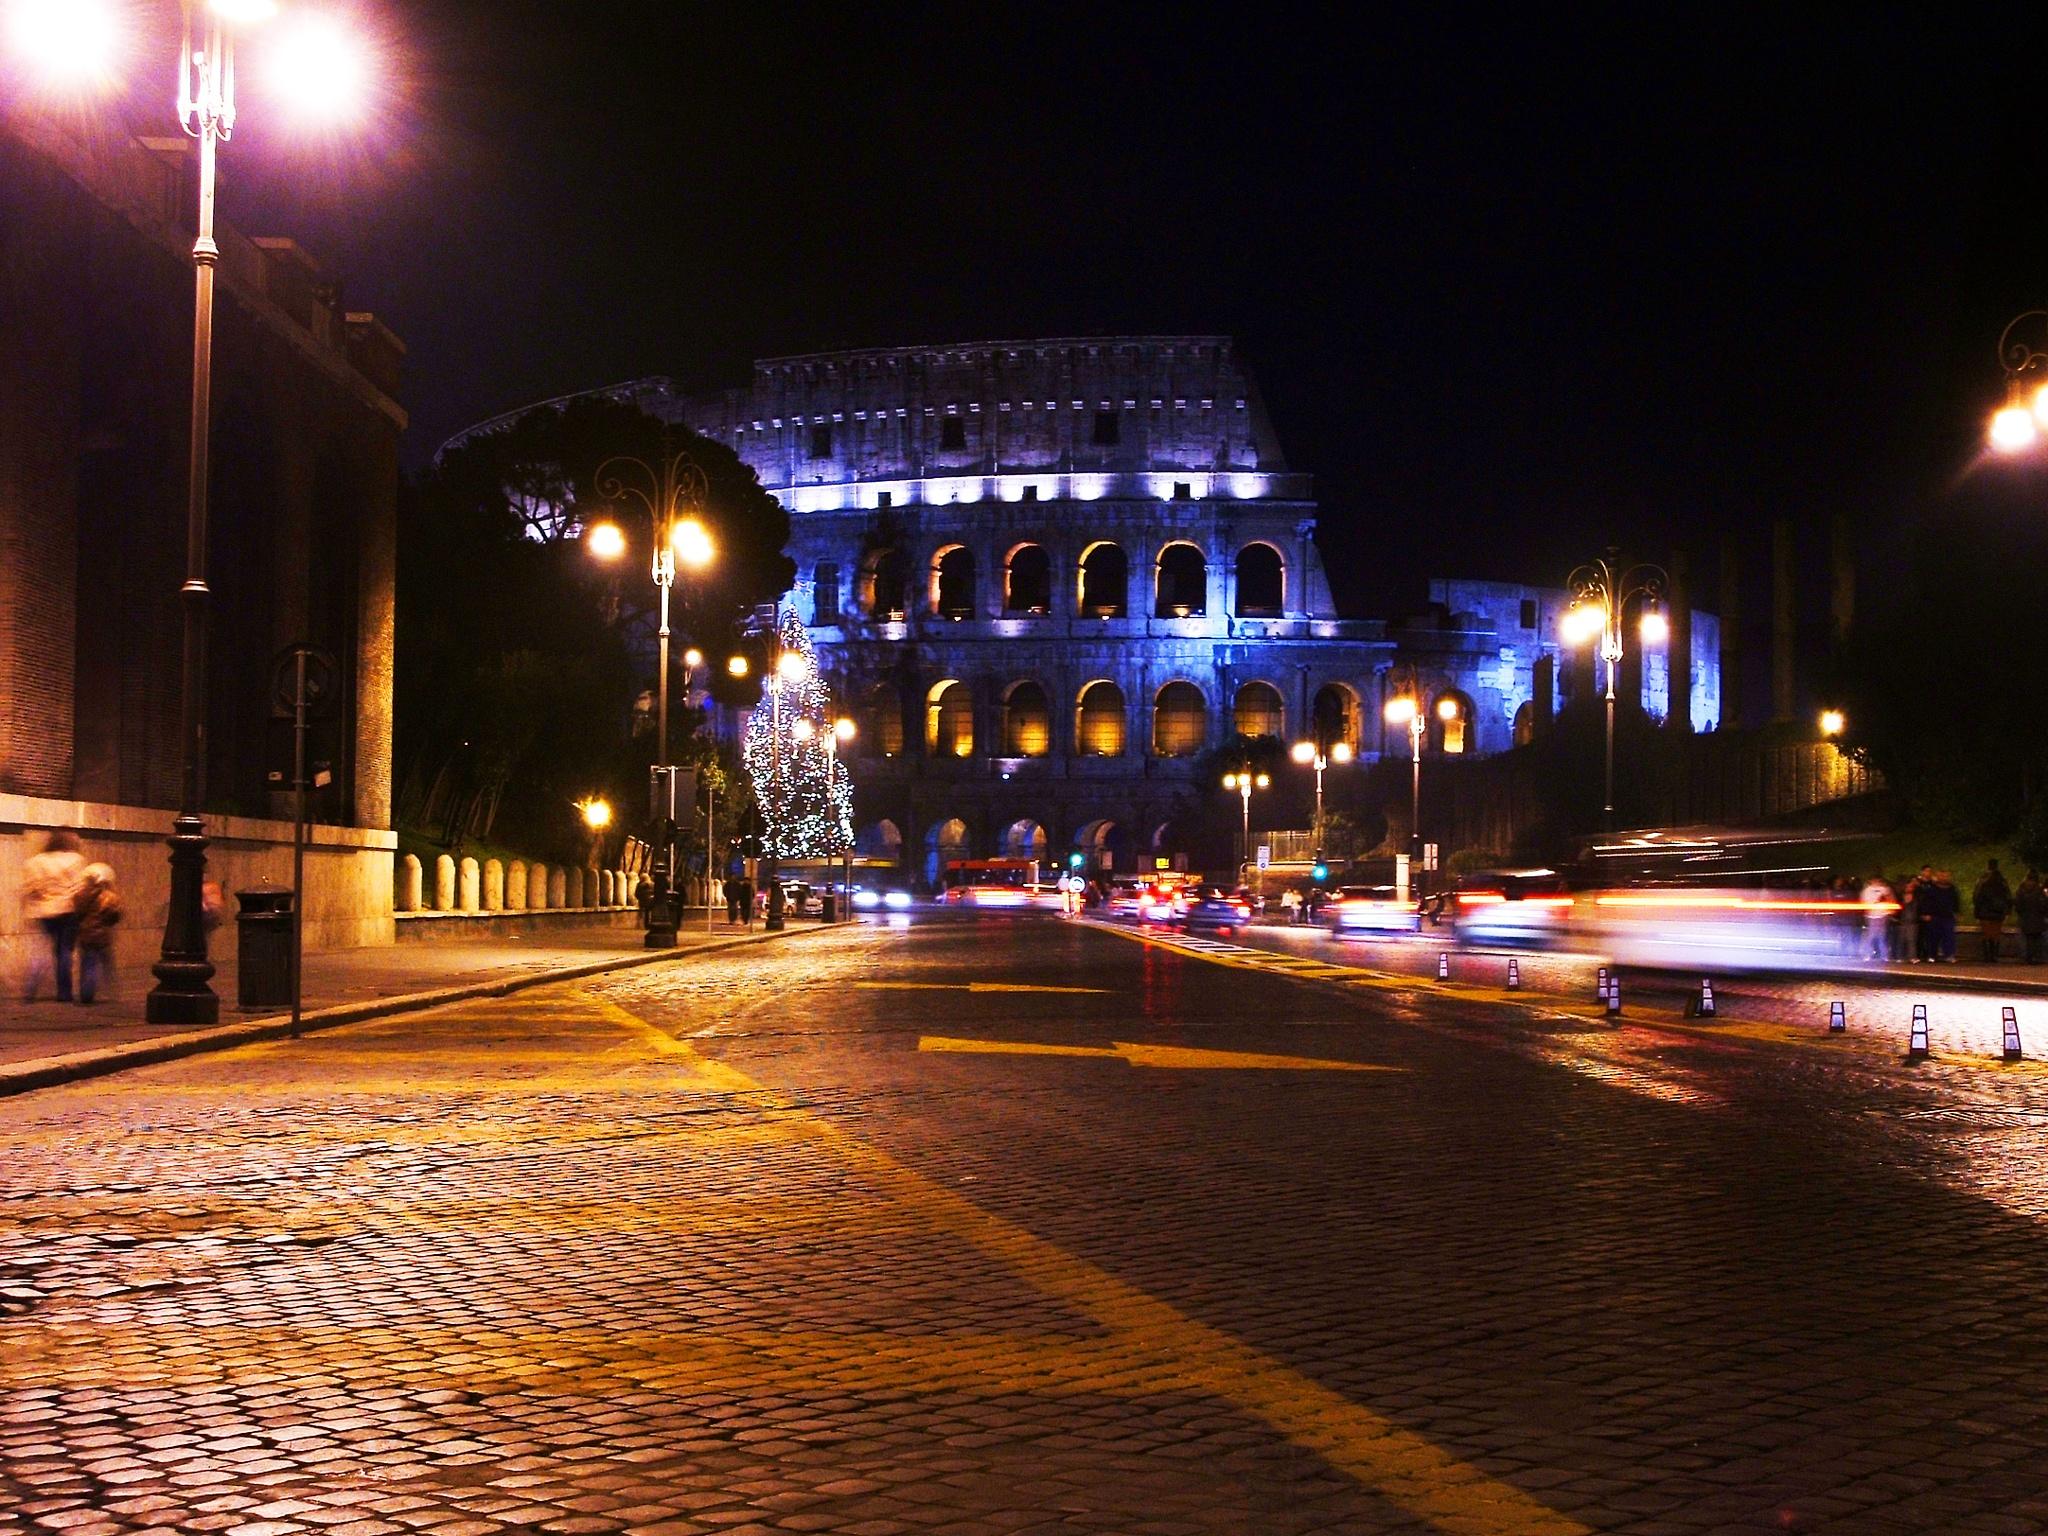 Colosseo by nigth by rafa00